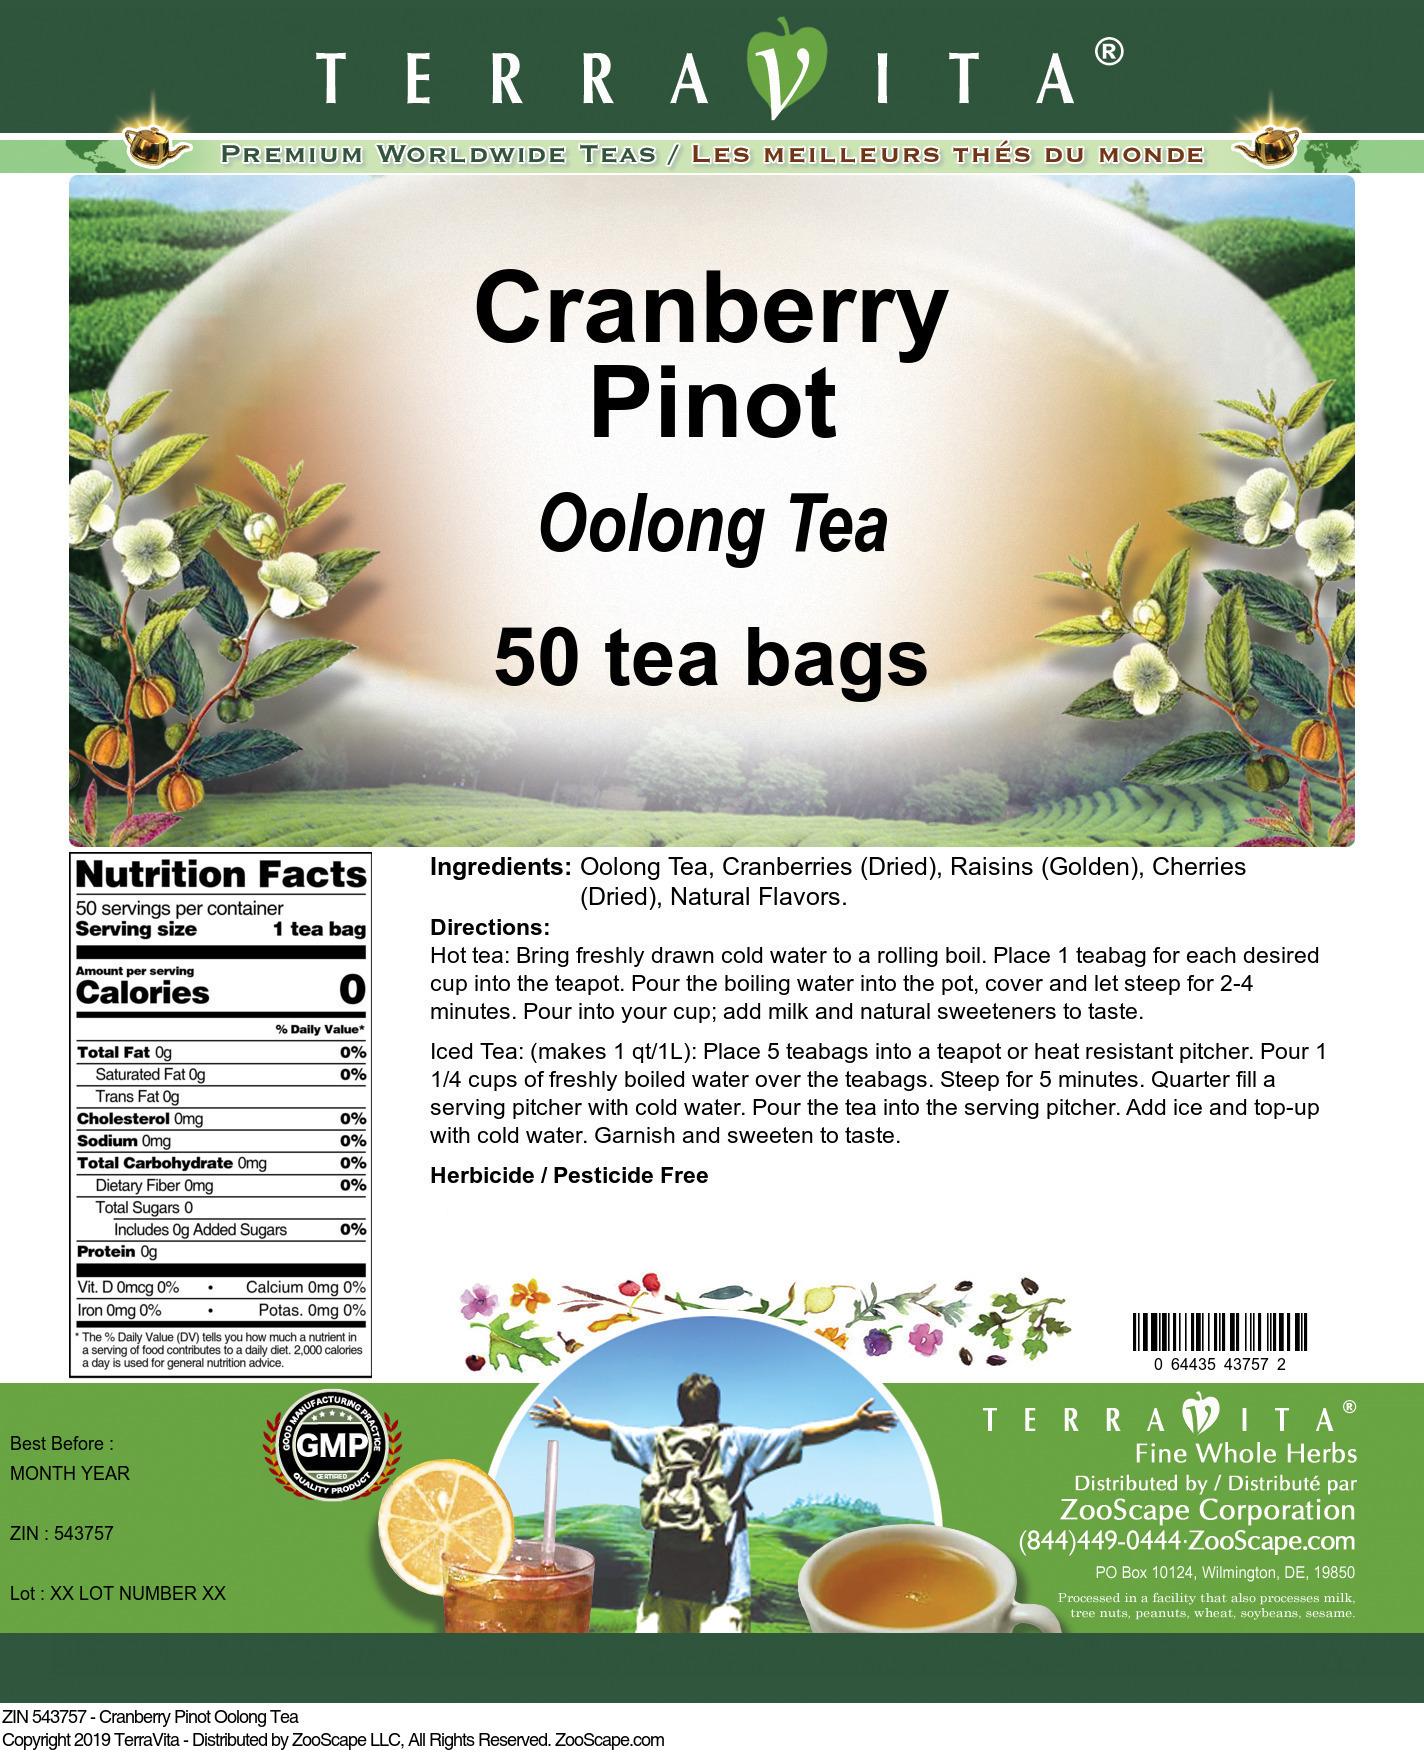 Cranberry Pinot Oolong Tea